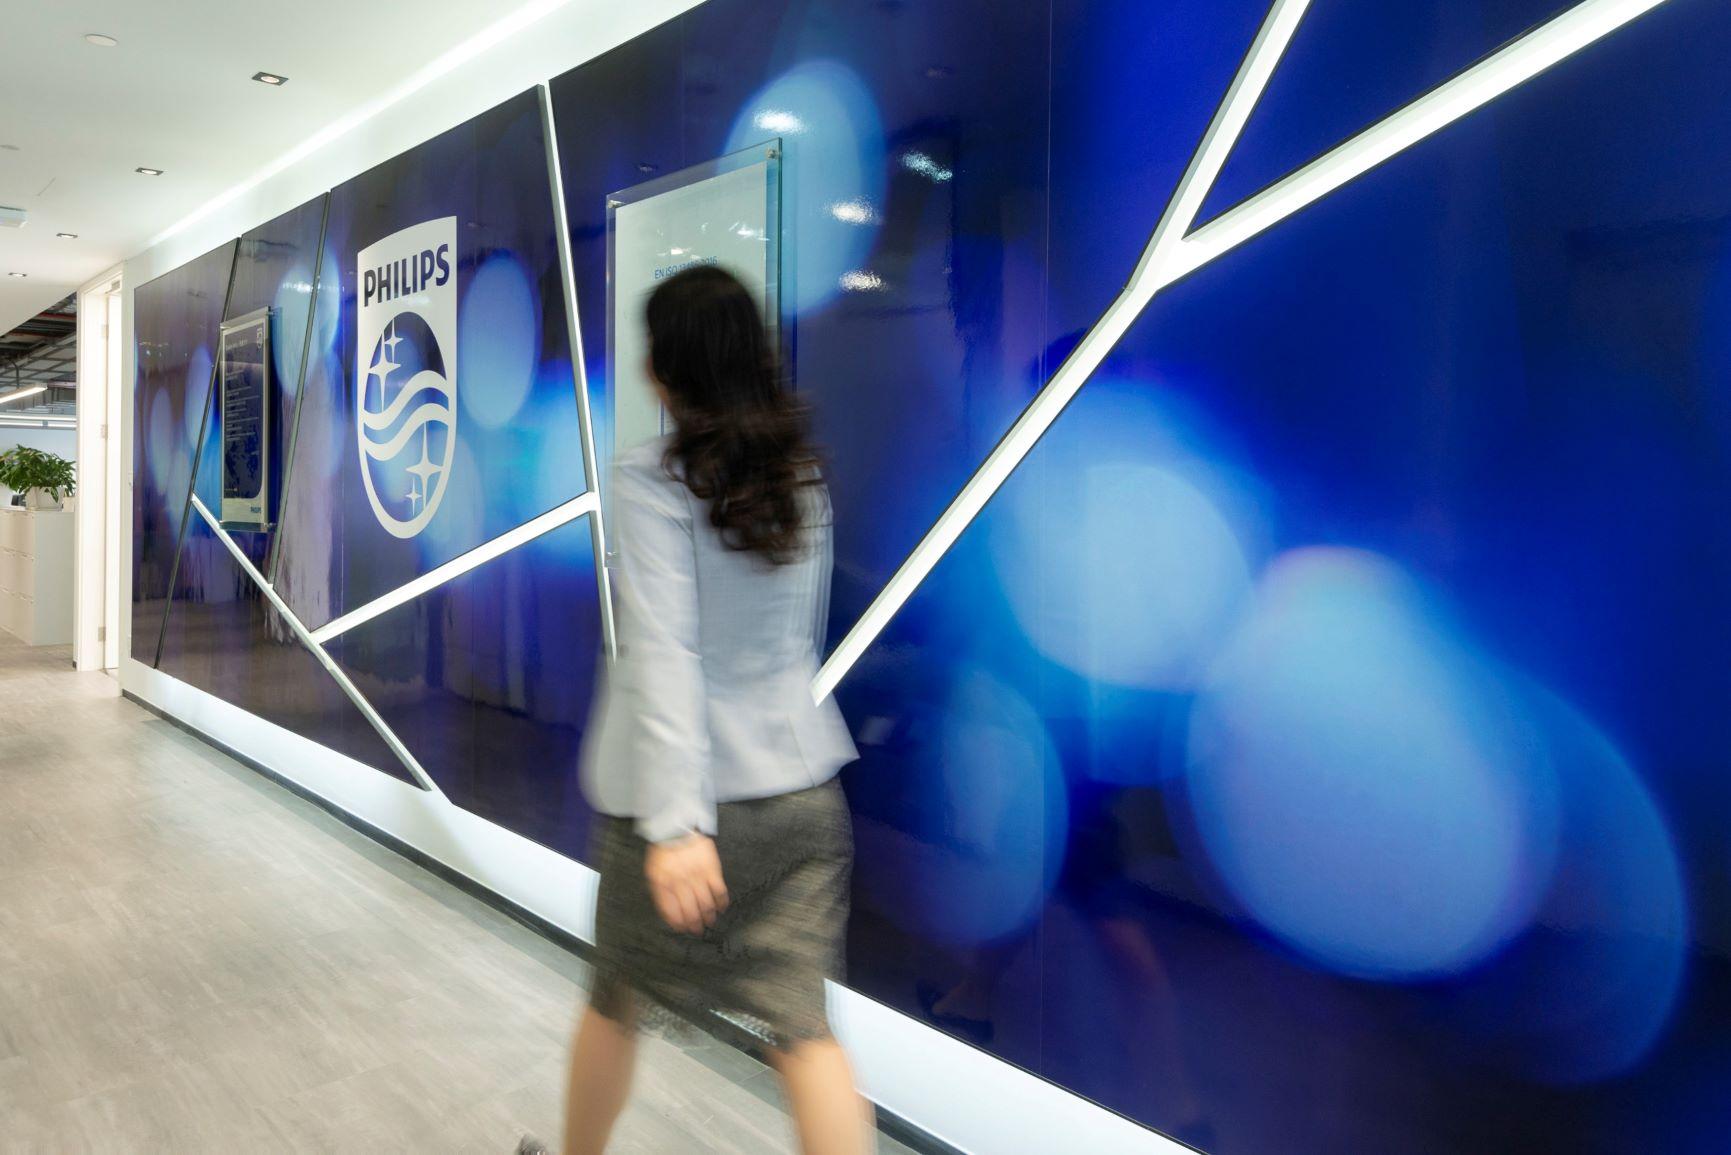 Philips Vietnam office space